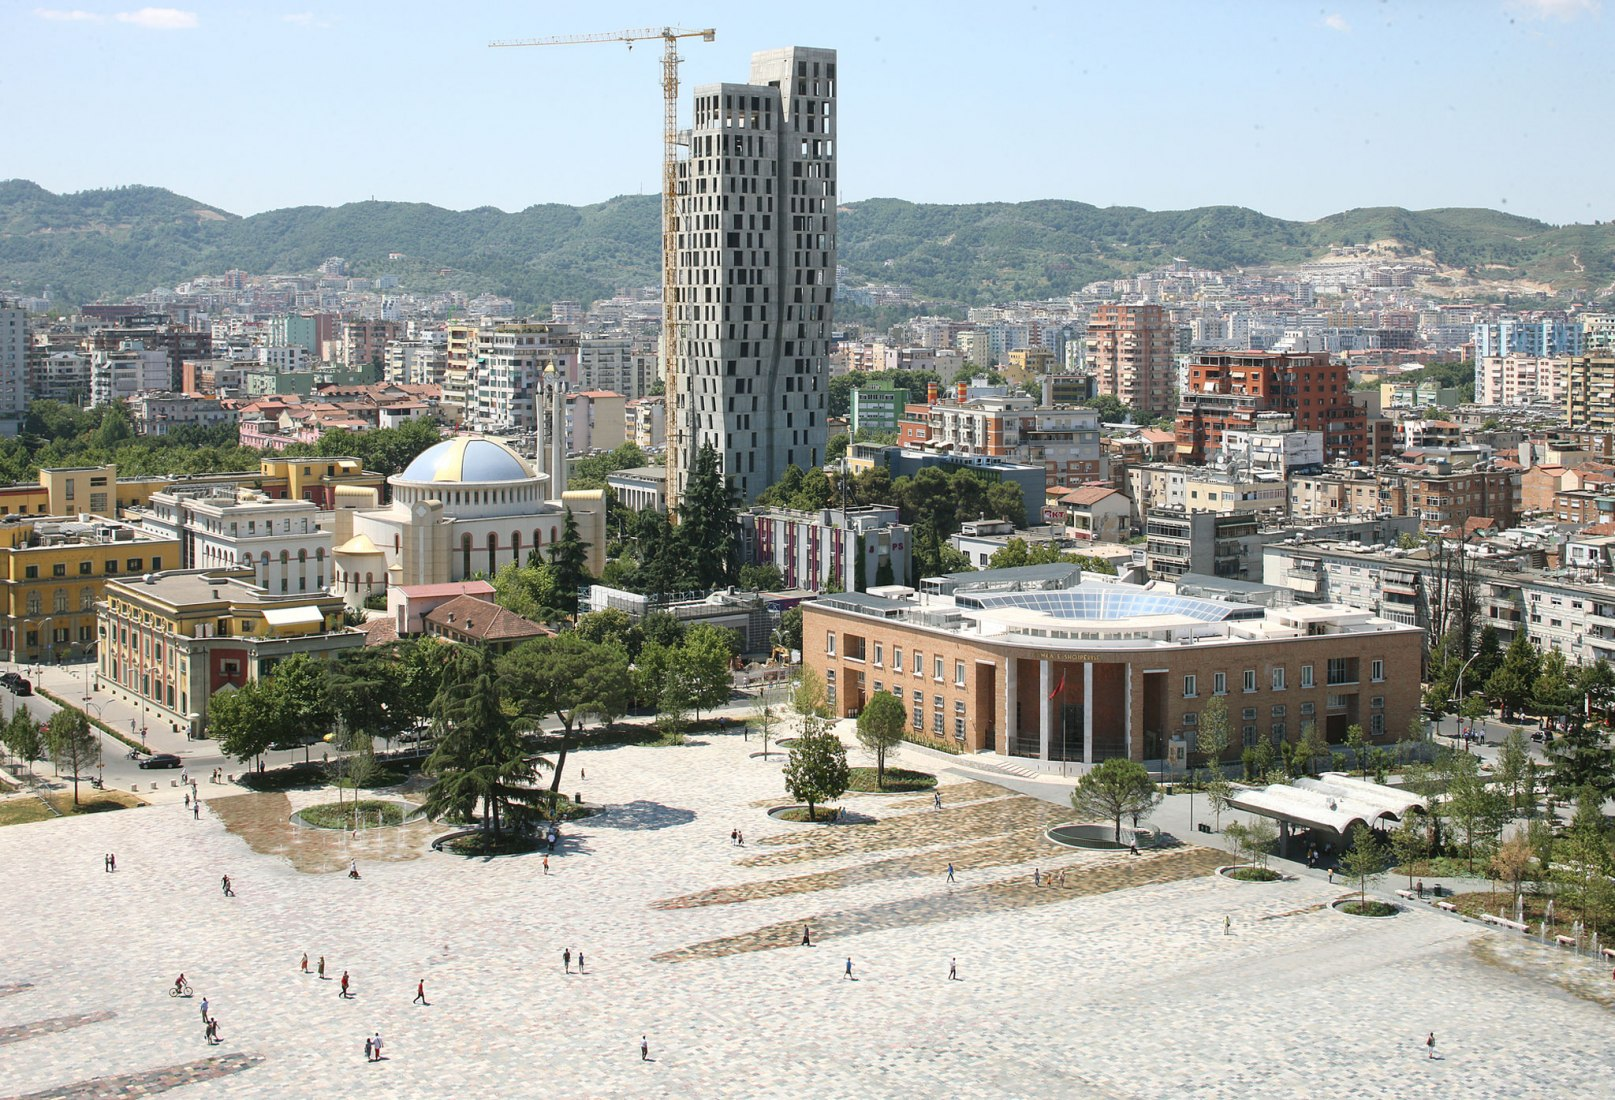 Plaza Skanderbeg por 51N4E. Fotografía por Filip Dujardin.